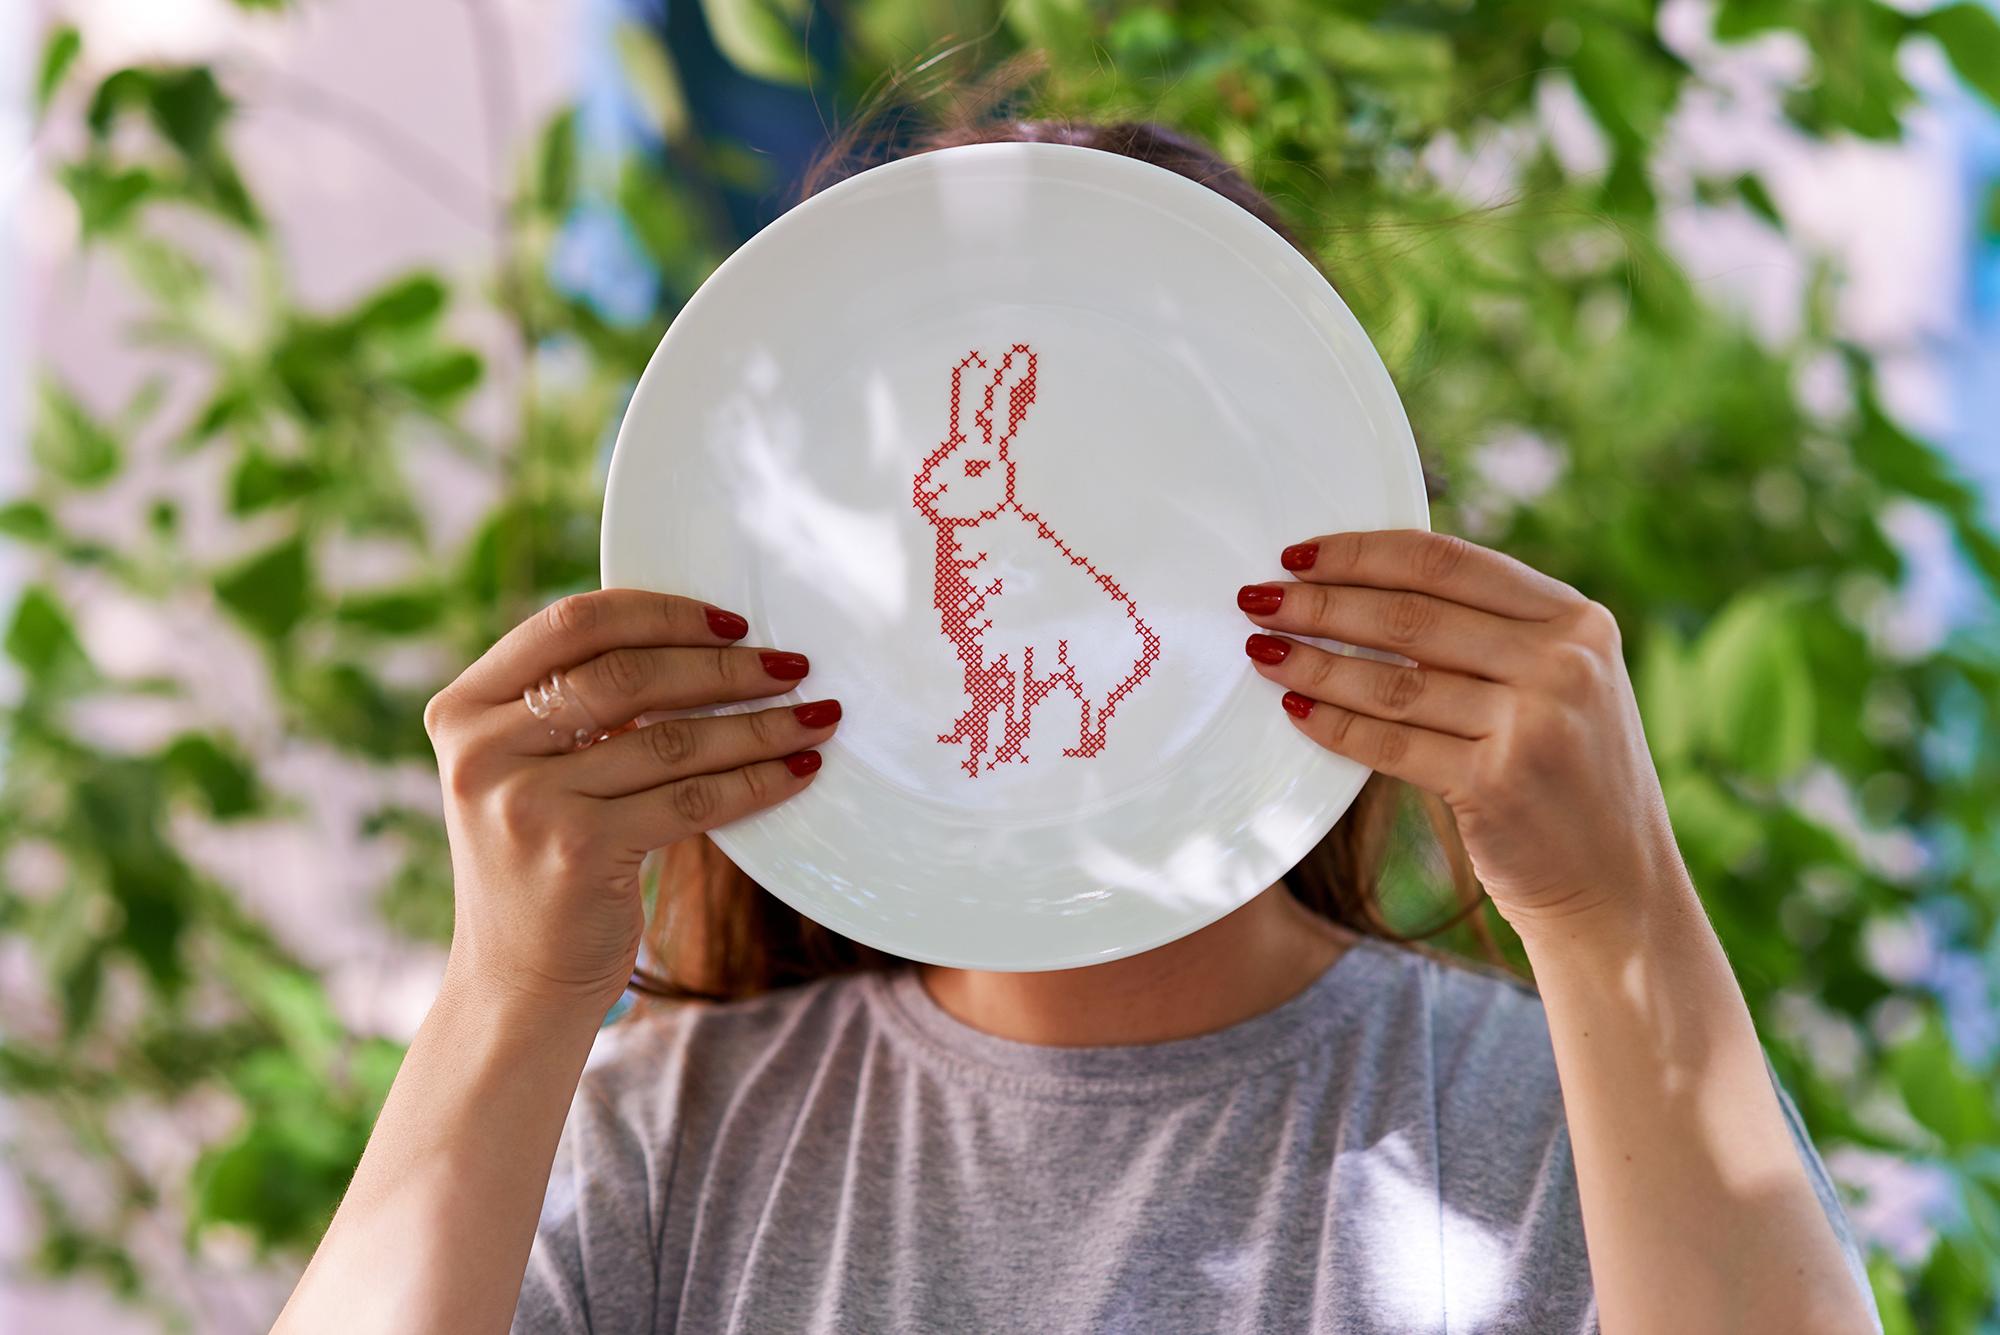 AMAI_product_LU_Plate «Follow two hares» (7)